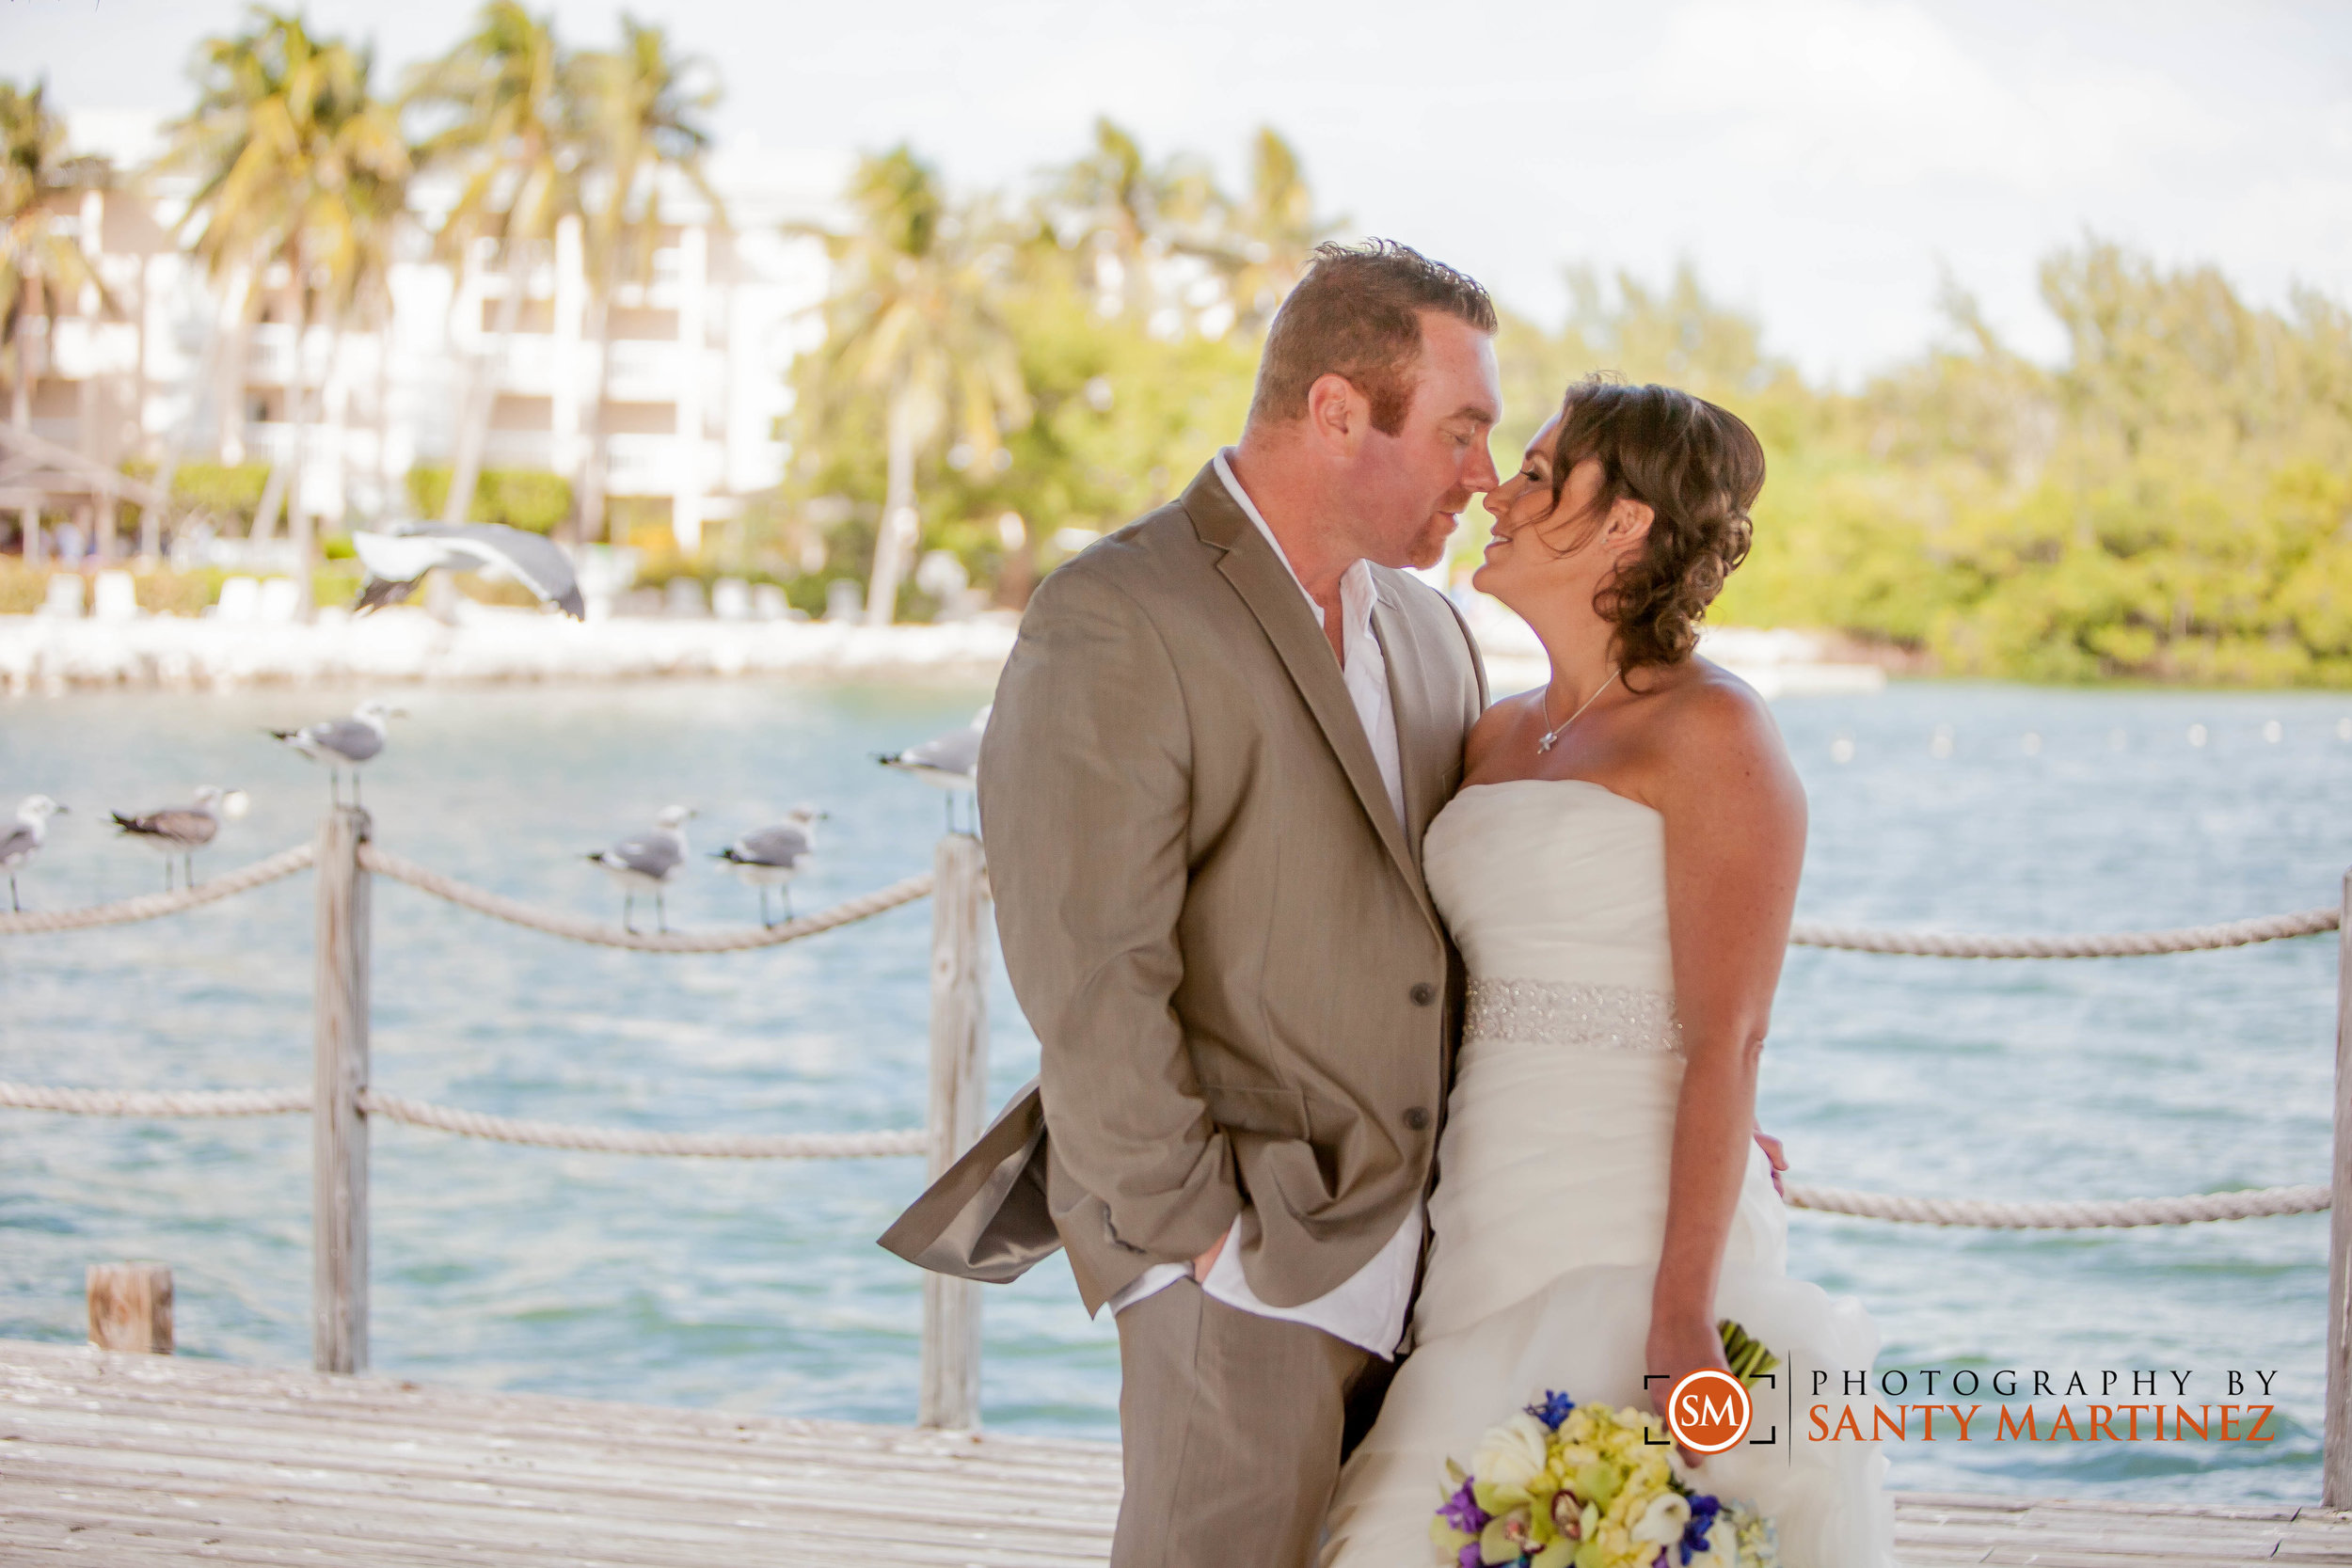 Photography by Santy Martinez - Miami Wedding Photographer-017.jpg